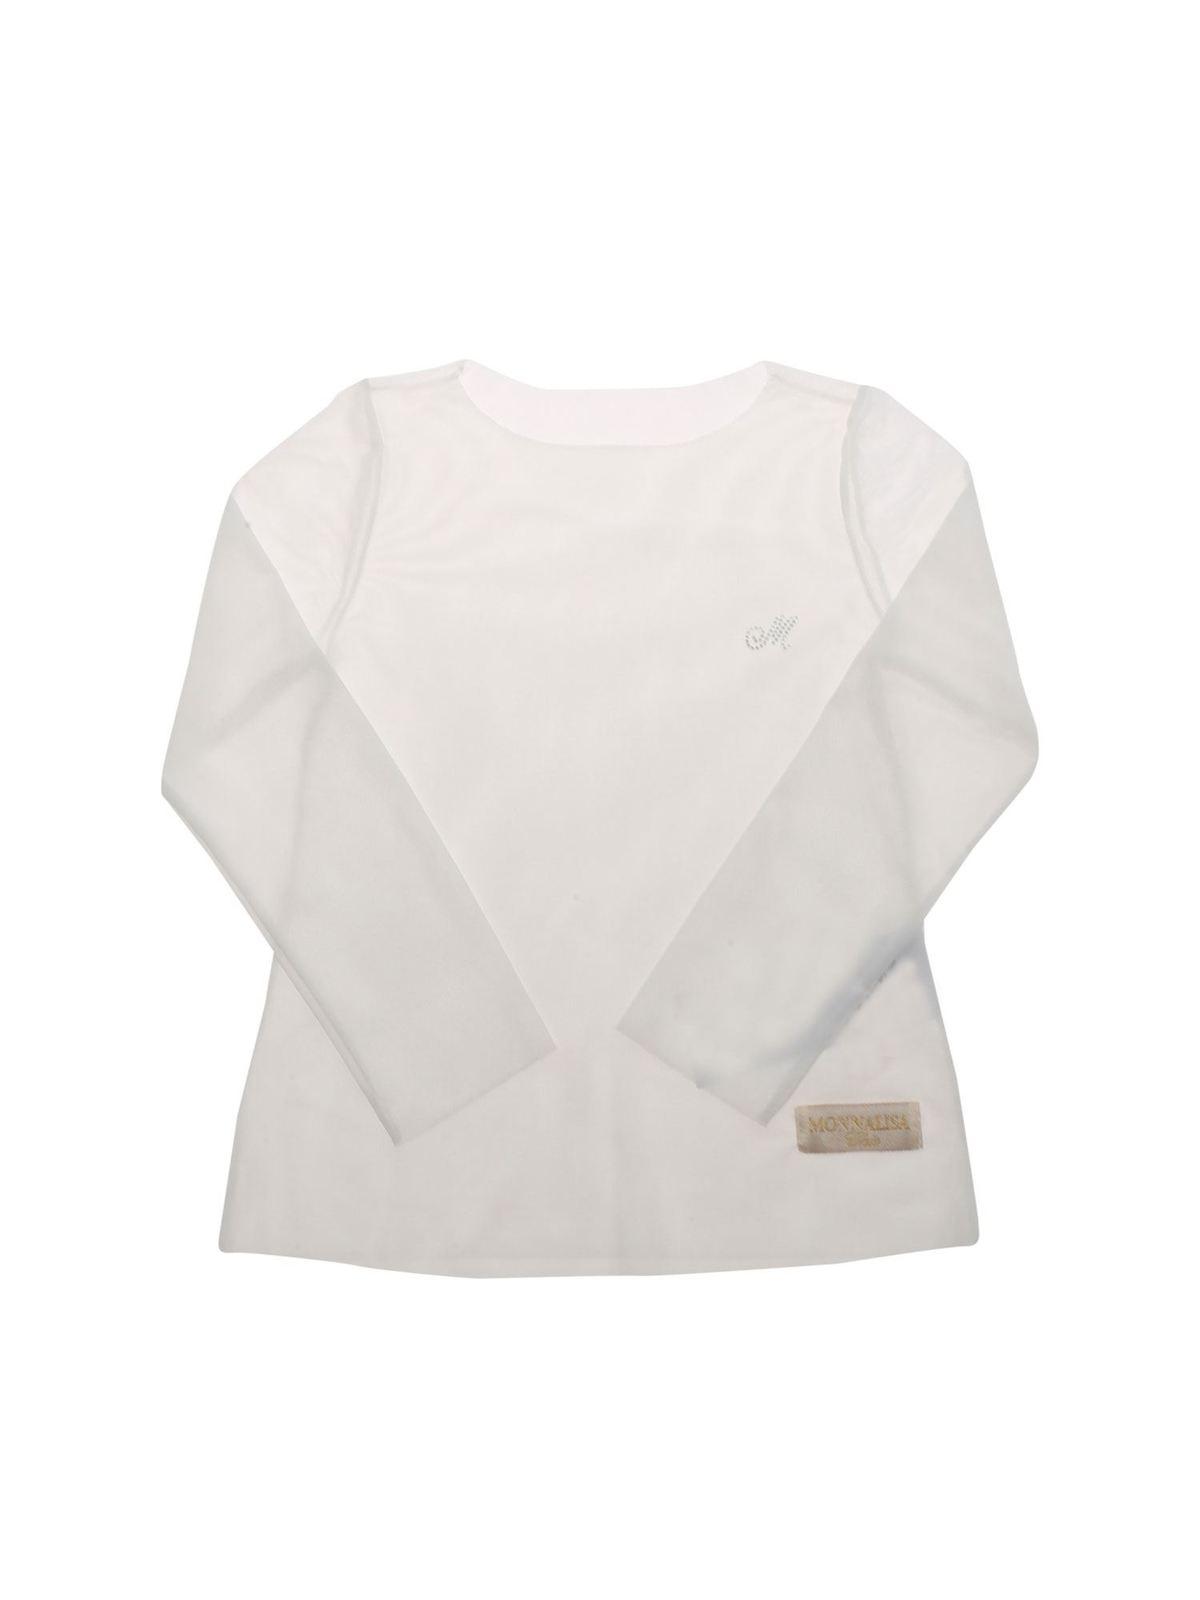 Monnalisa TULLE T-SHIRT IN WHITE